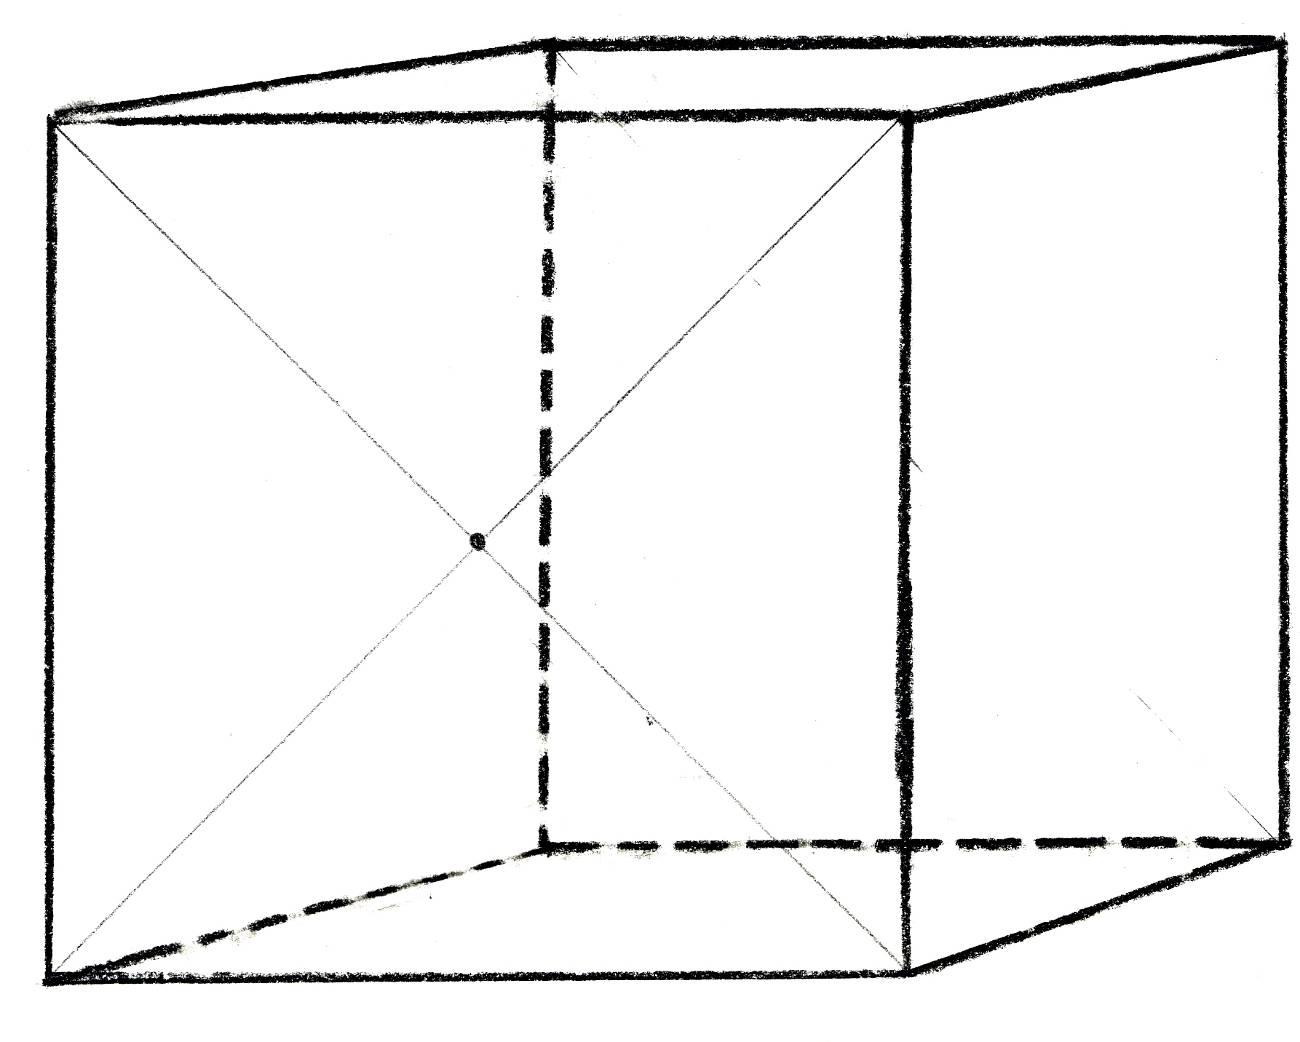 http://lib.convdocs.org/pars_docs/refs/89/88668/88668_html_m365bd62d.jpg